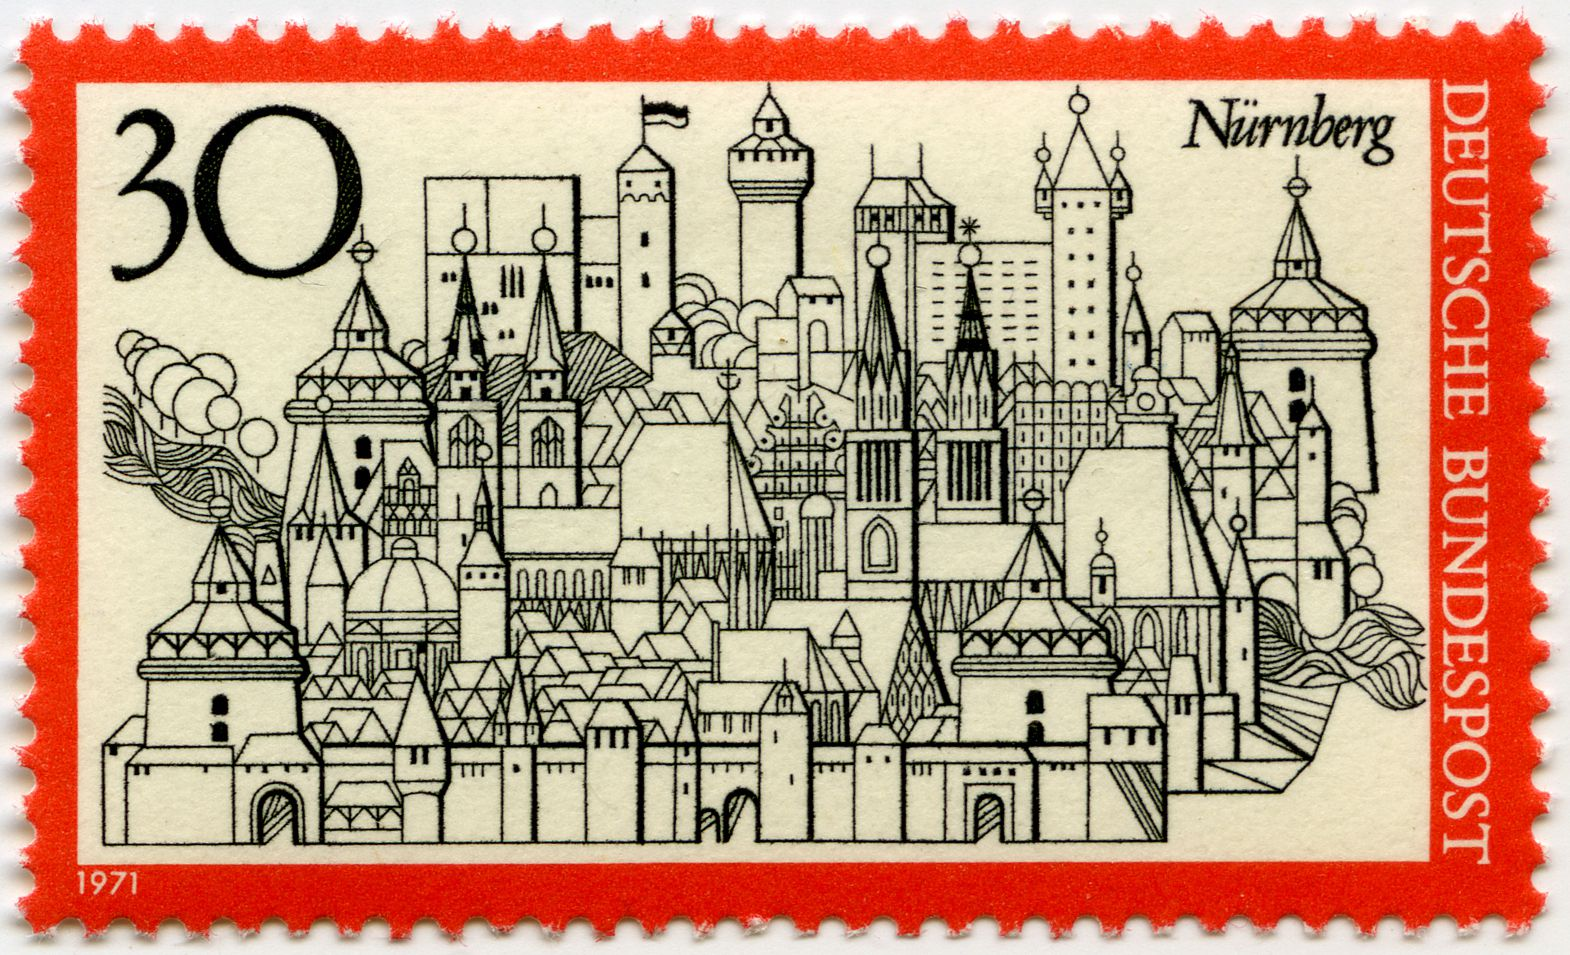 Nürnberg Gesamtansicht